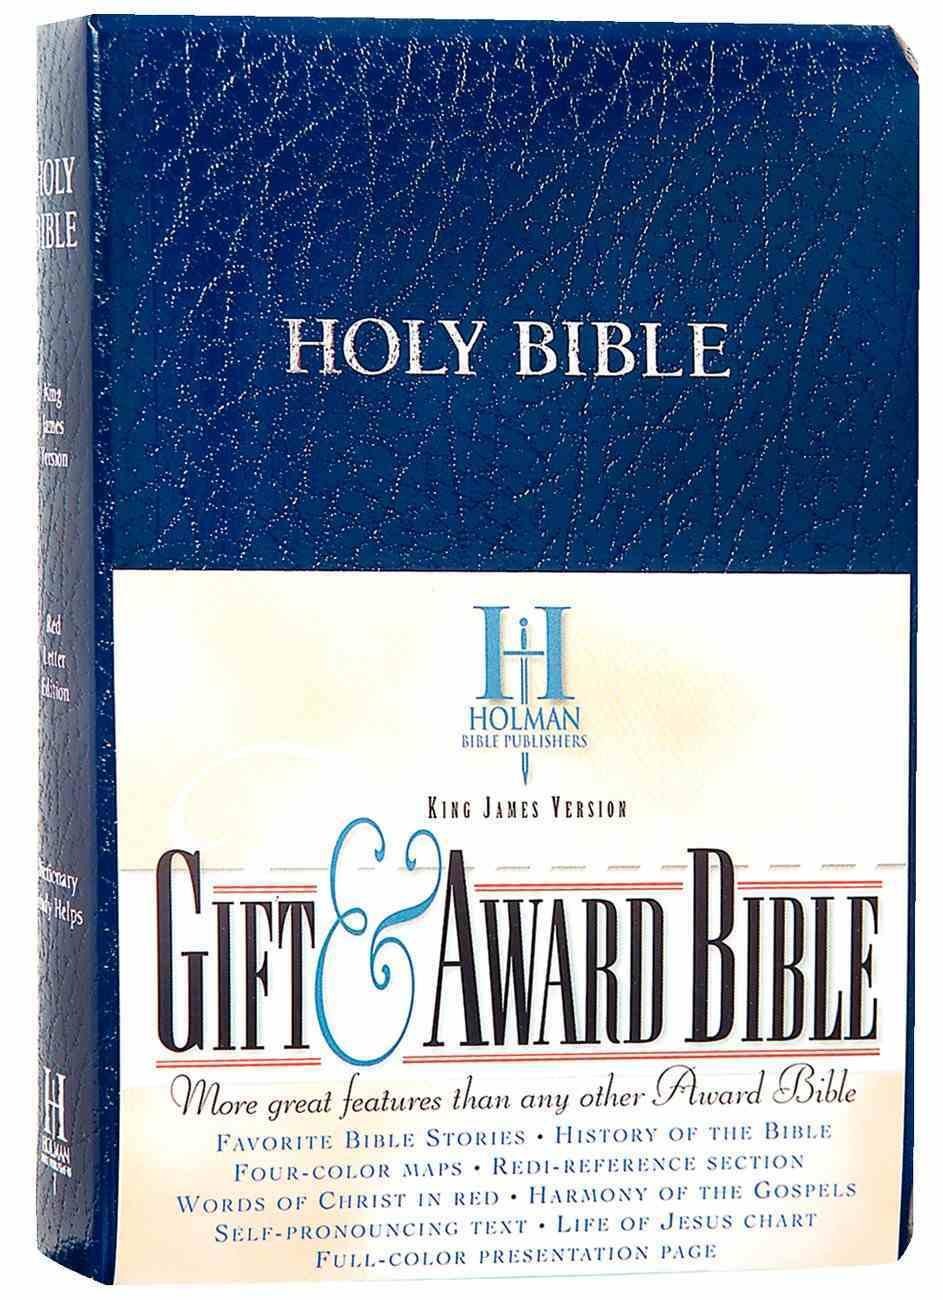 KJV Gift Award Bible Blue Imitation Leather